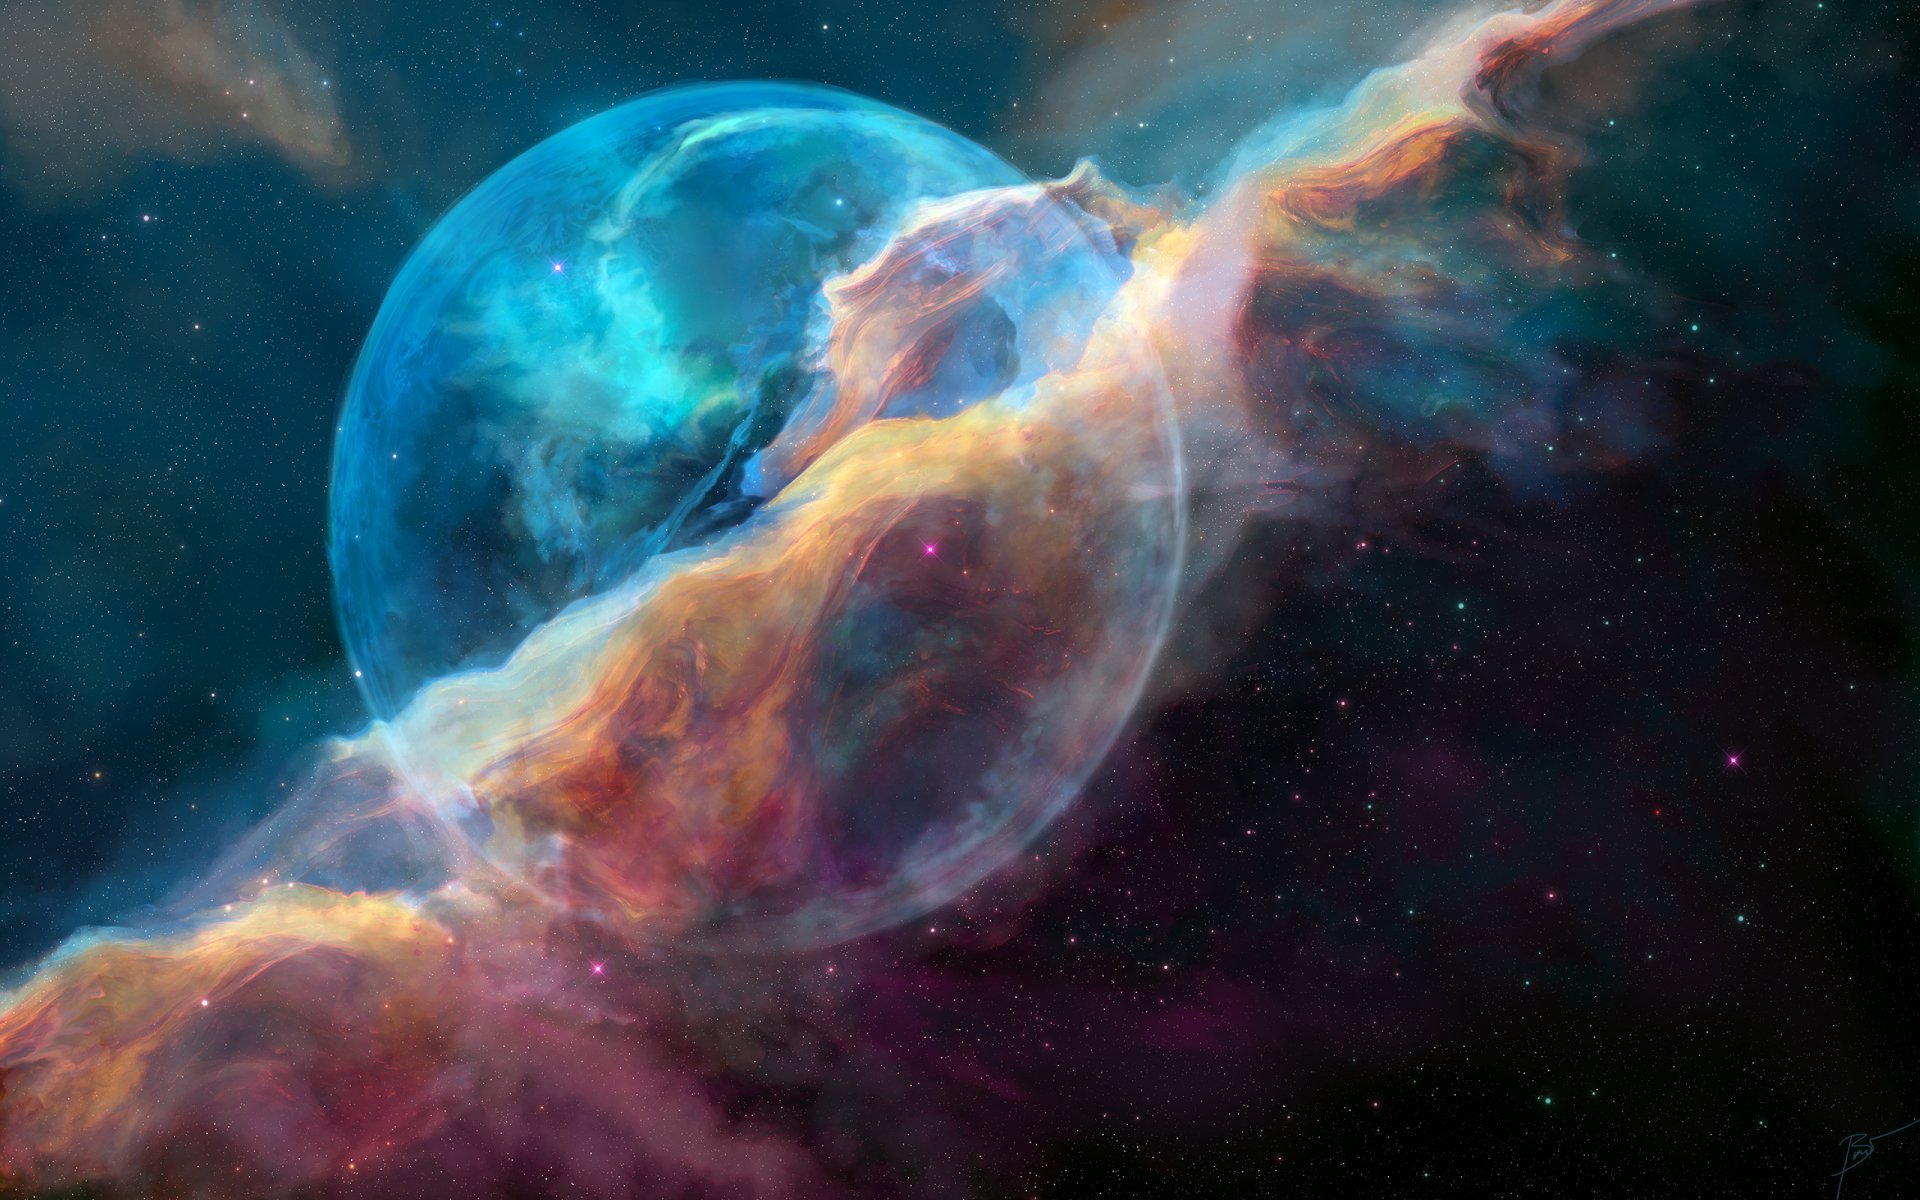 Sci Fi - Space  Sci Fi Planet Nebula Colorful Wallpaper